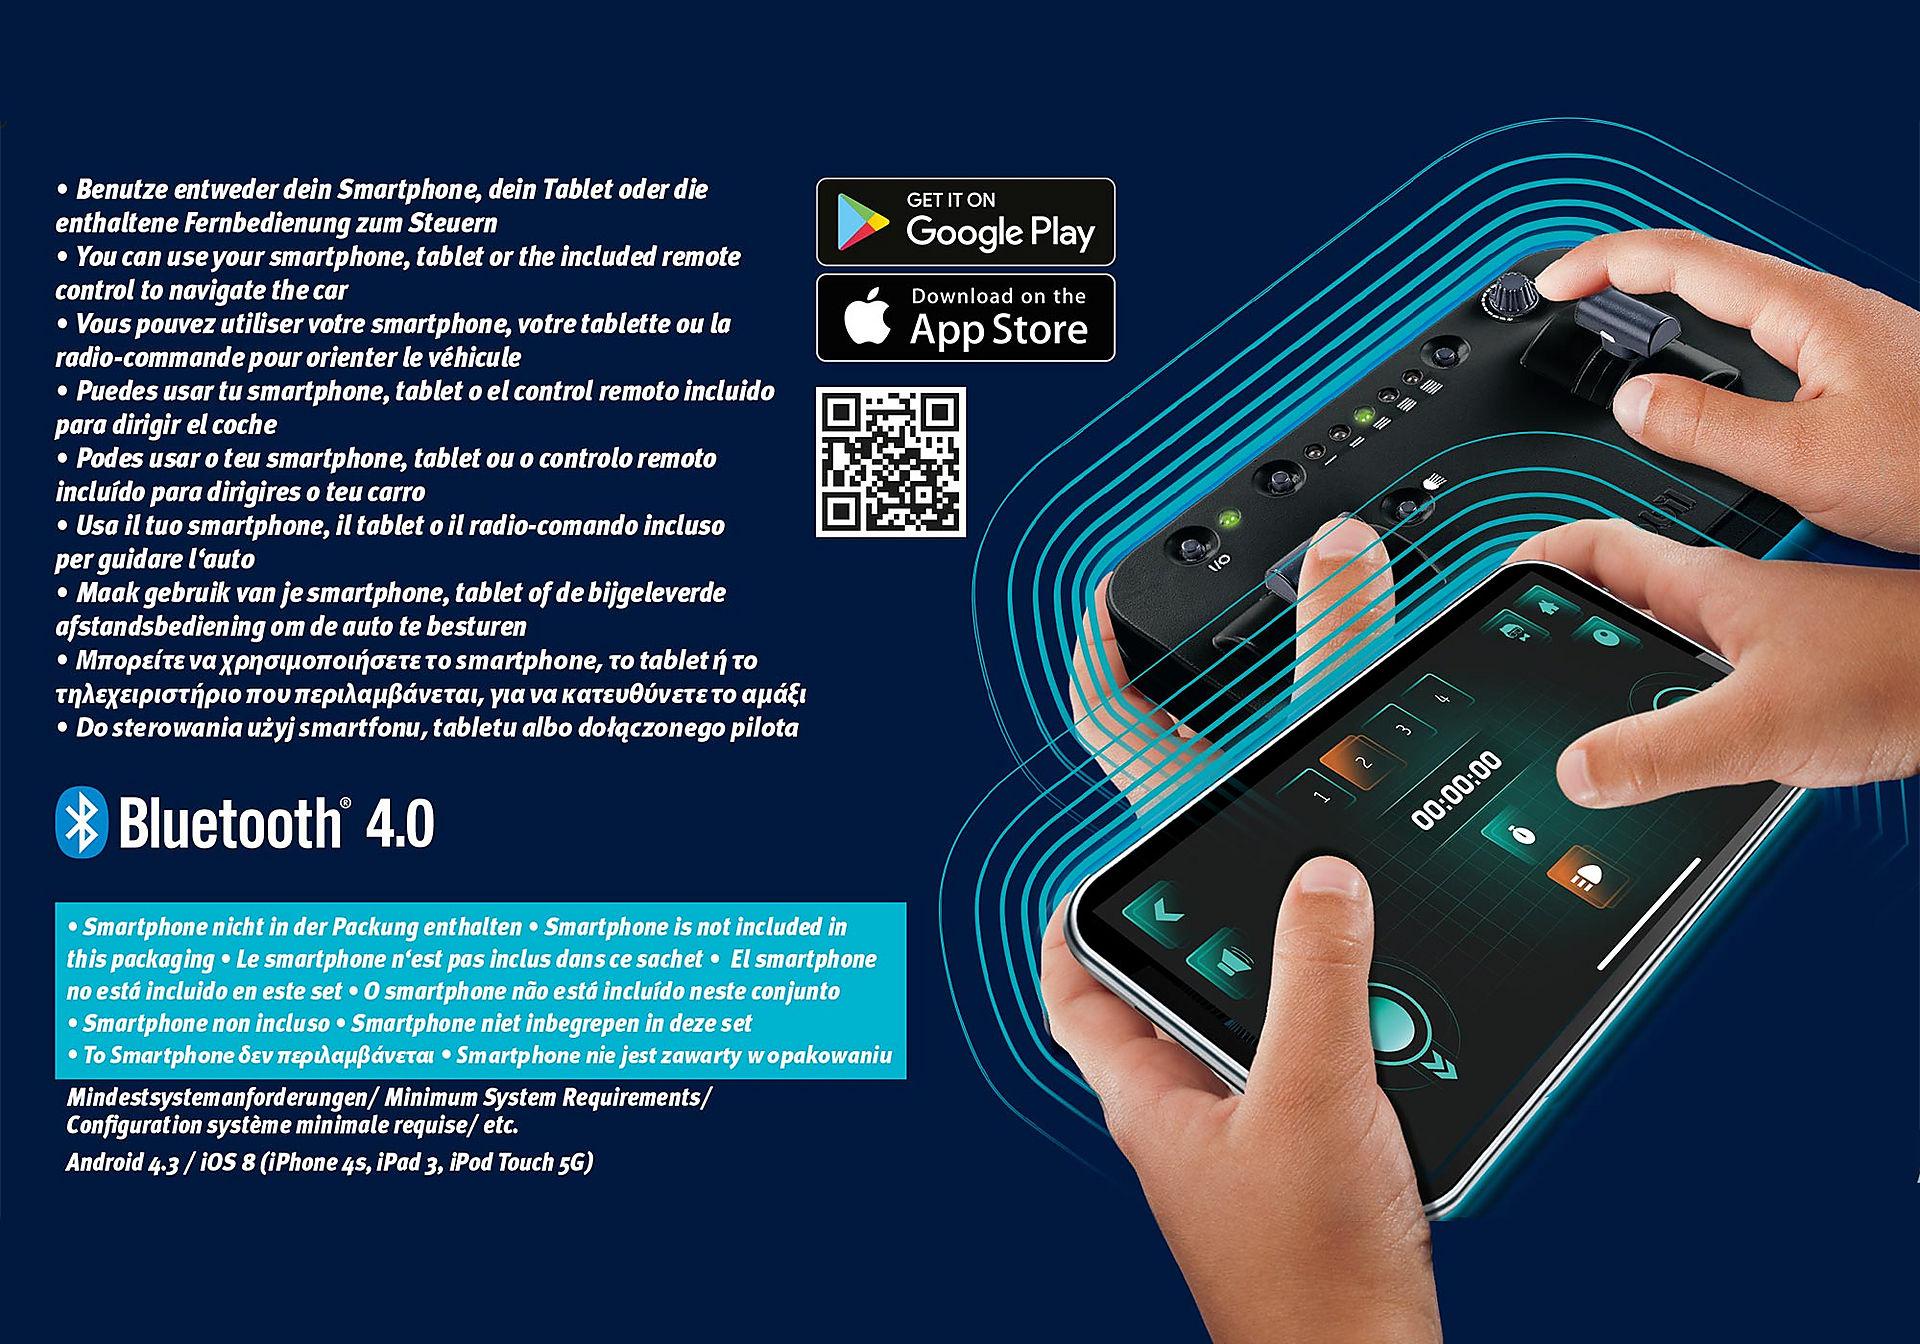 http://media.playmobil.com/i/playmobil/70078_product_extra5/PLAYMOBIL:THE MOVIE Rex Dasher's Porsche Mission E